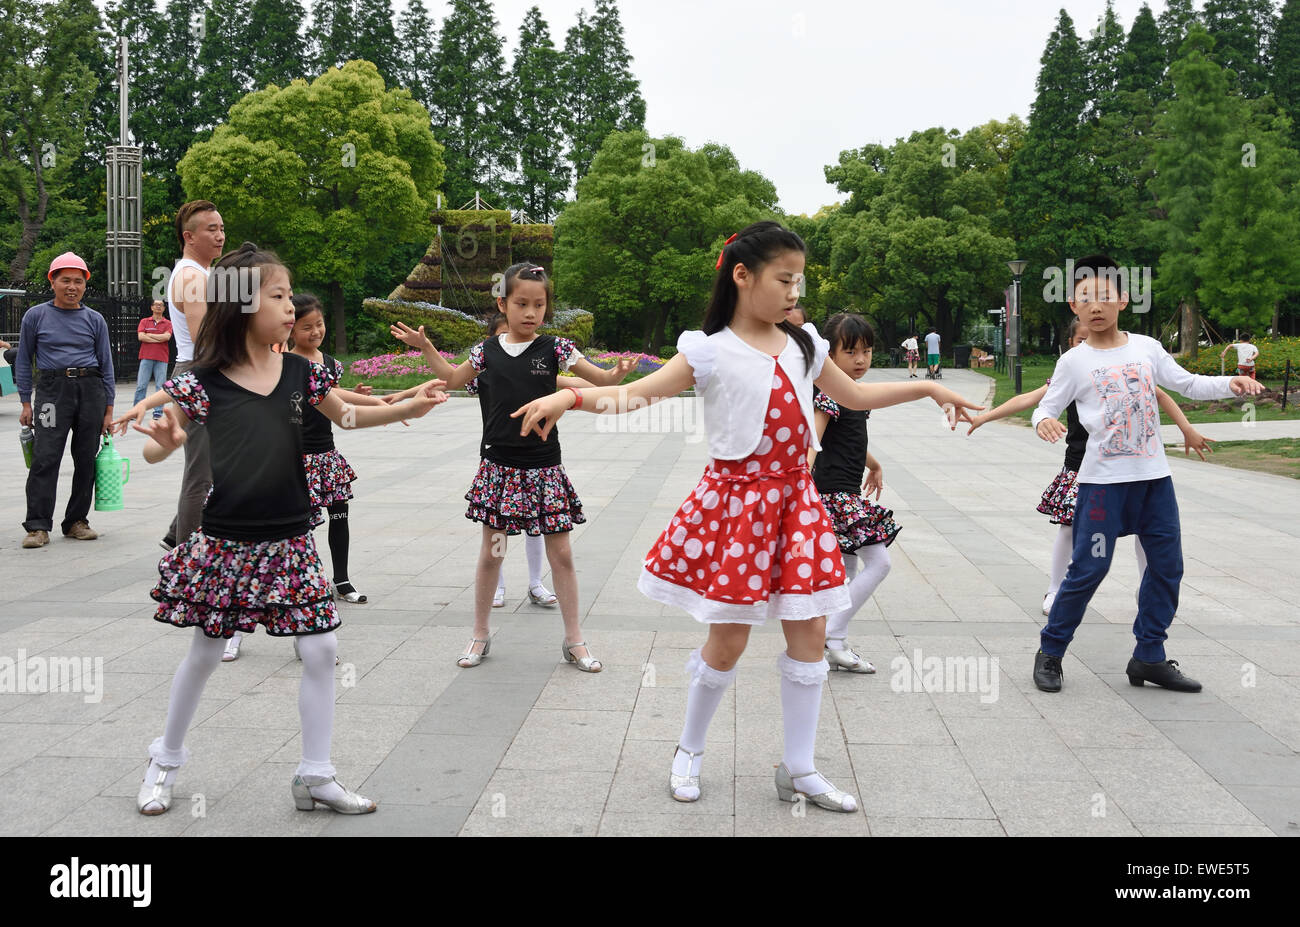 Ragazze che ballano classe la Shanghai Giardino Botanico Xuhui District cinese Cina Immagini Stock